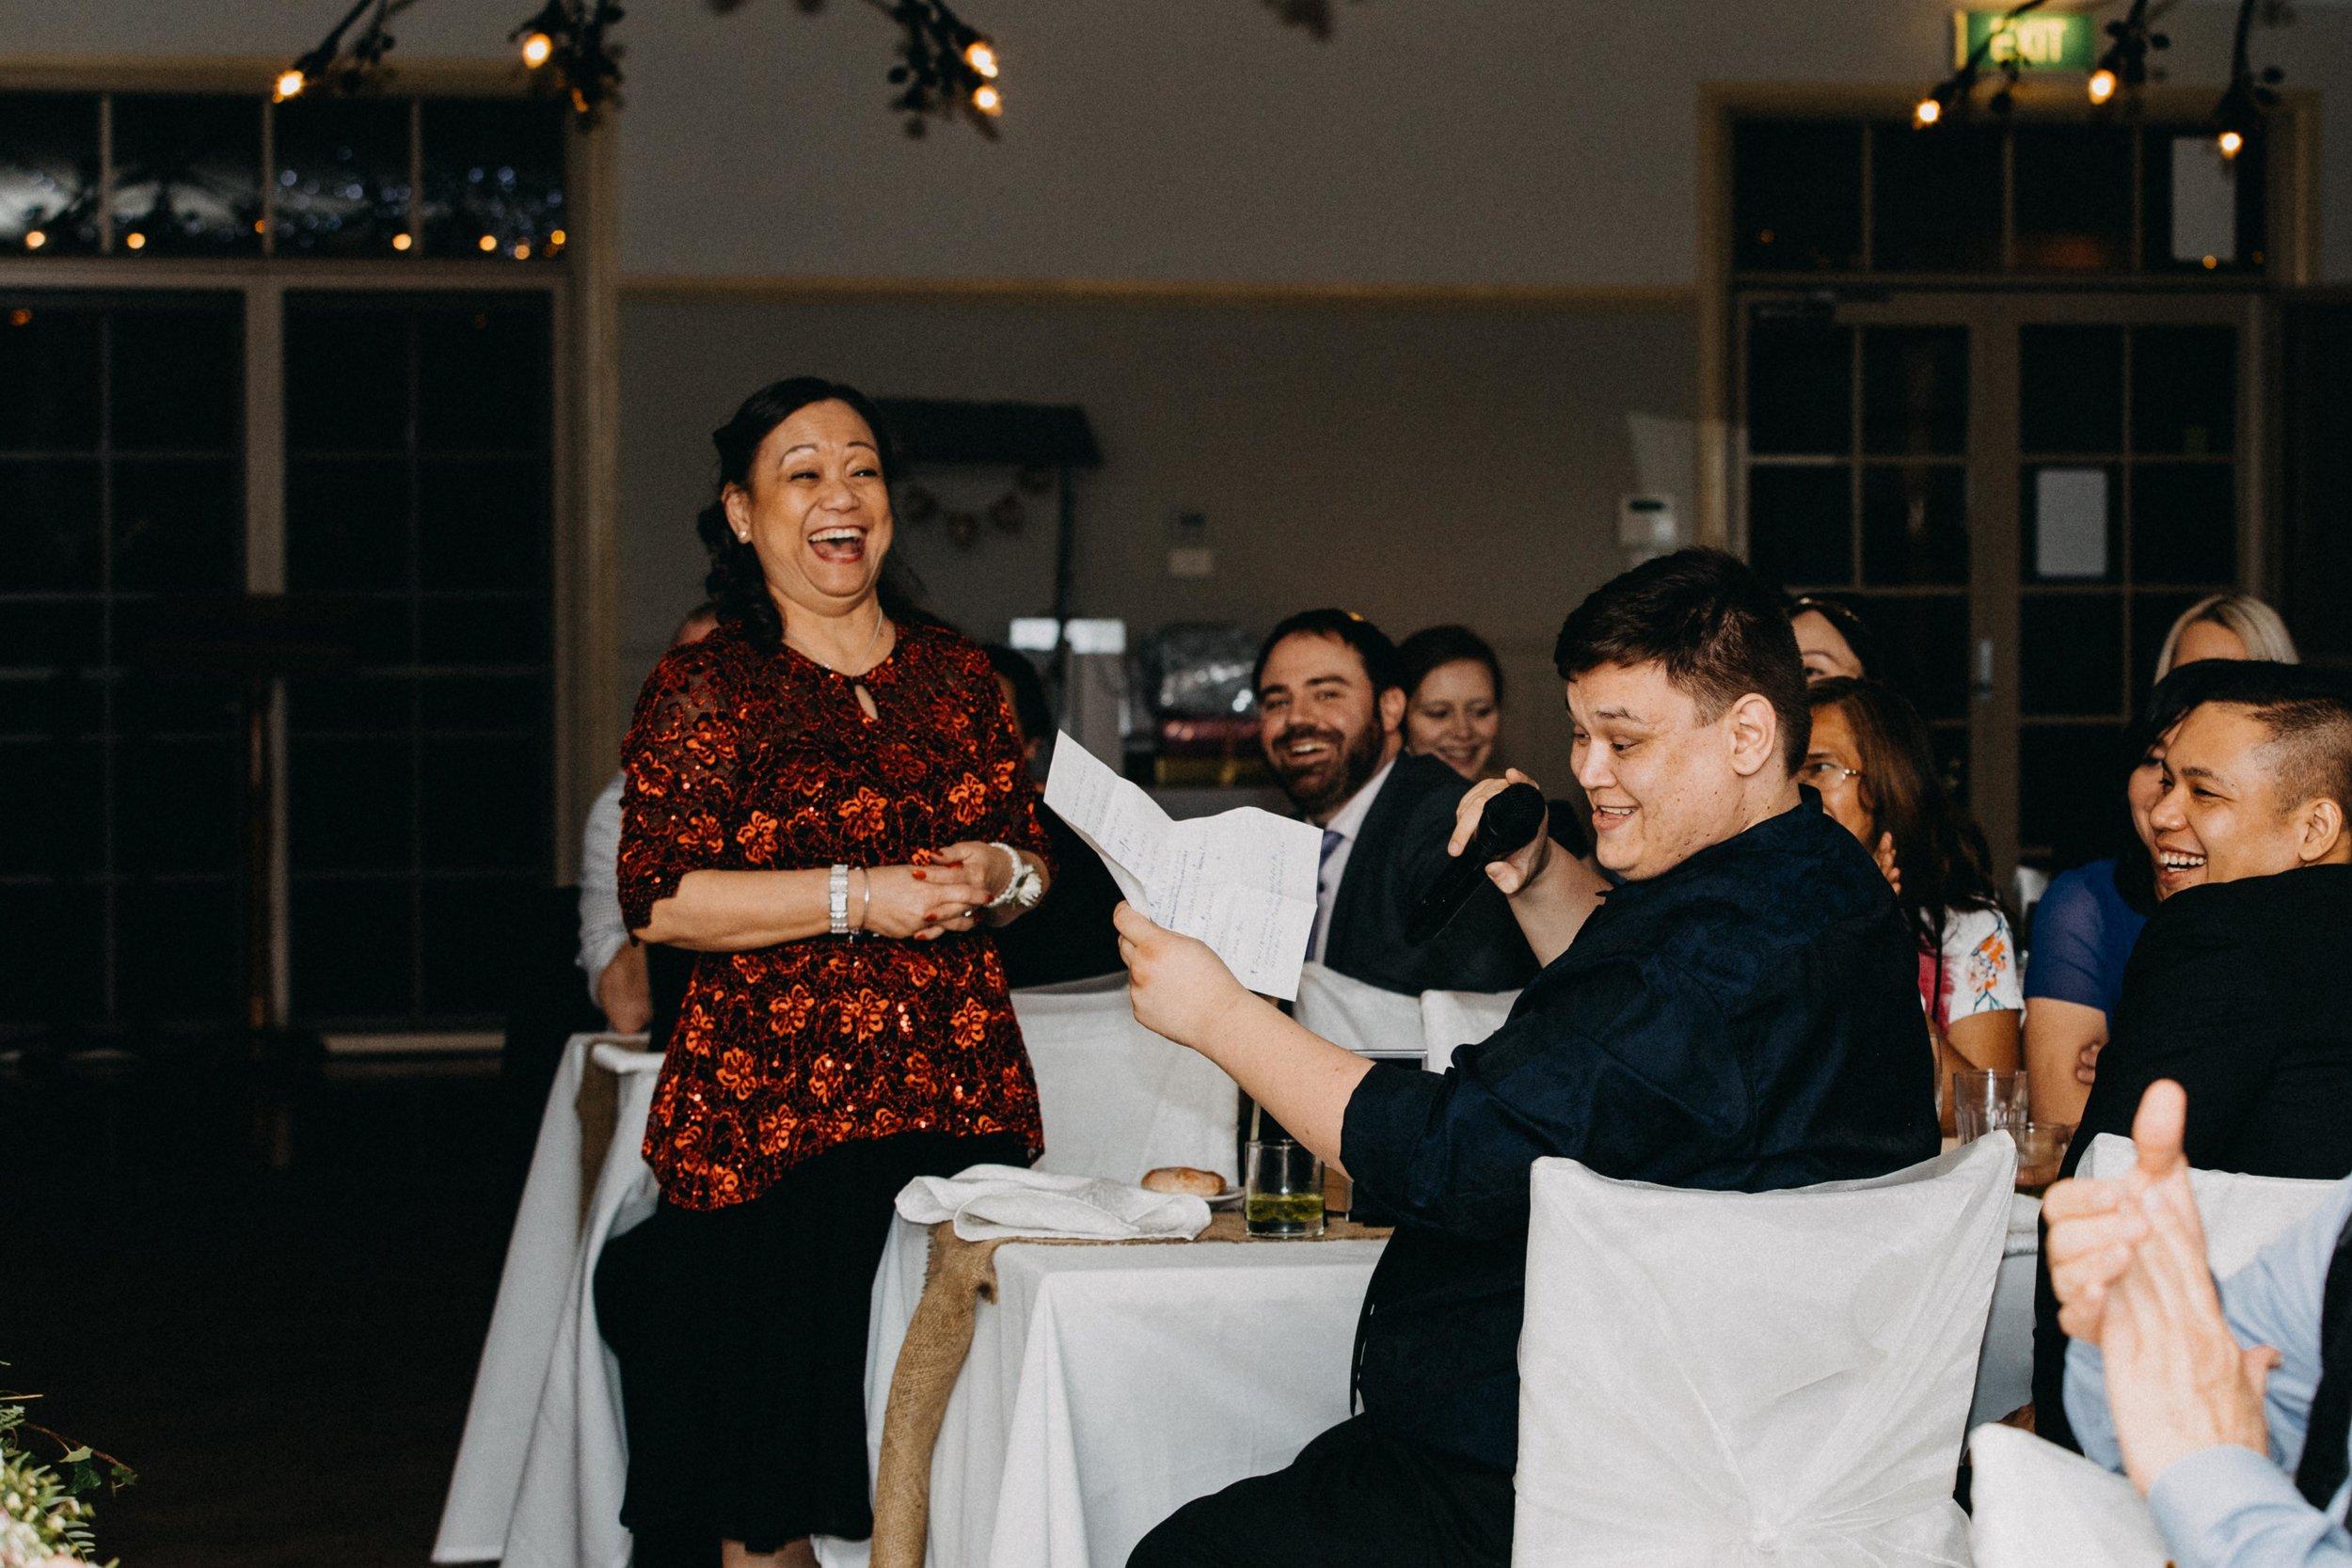 appin-house-wedding-macarthur-www.emilyobrienphotography.net-165.jpg